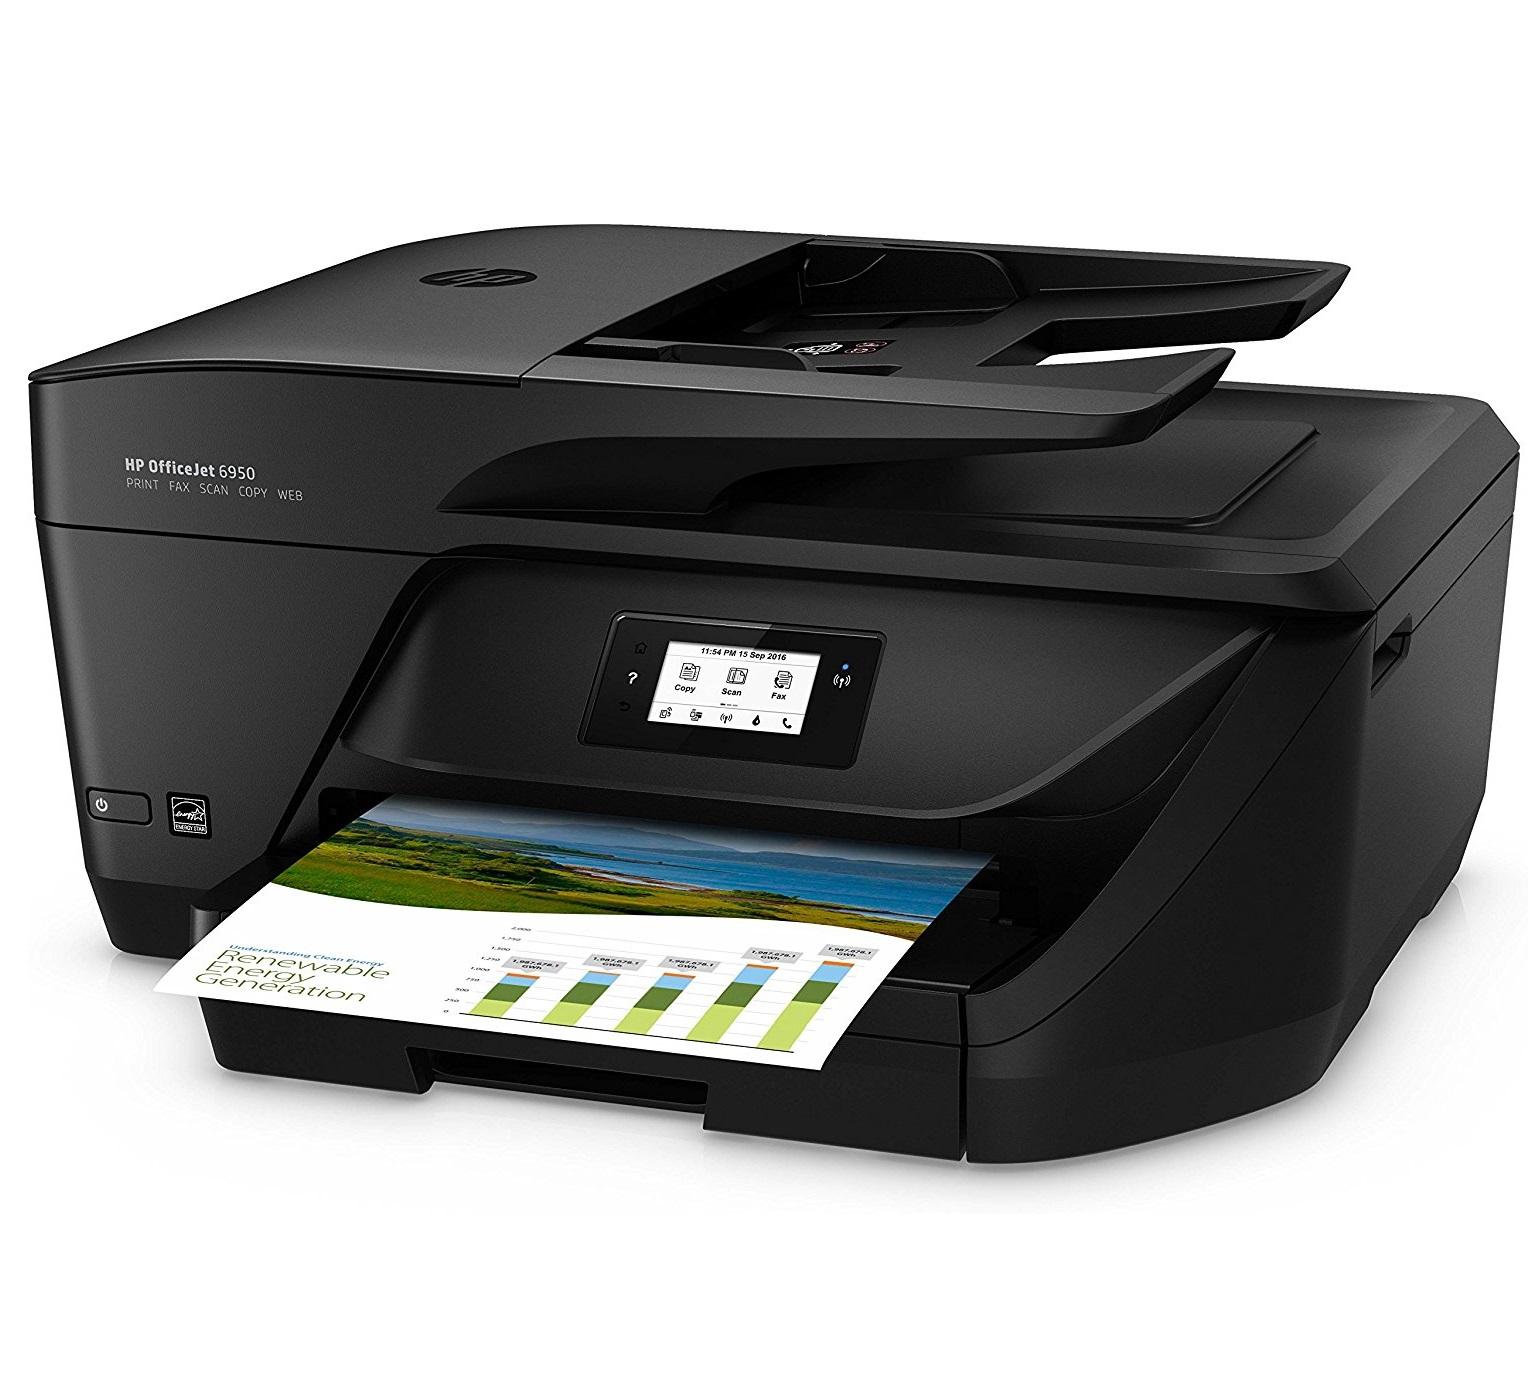 meilleure imprimante a3